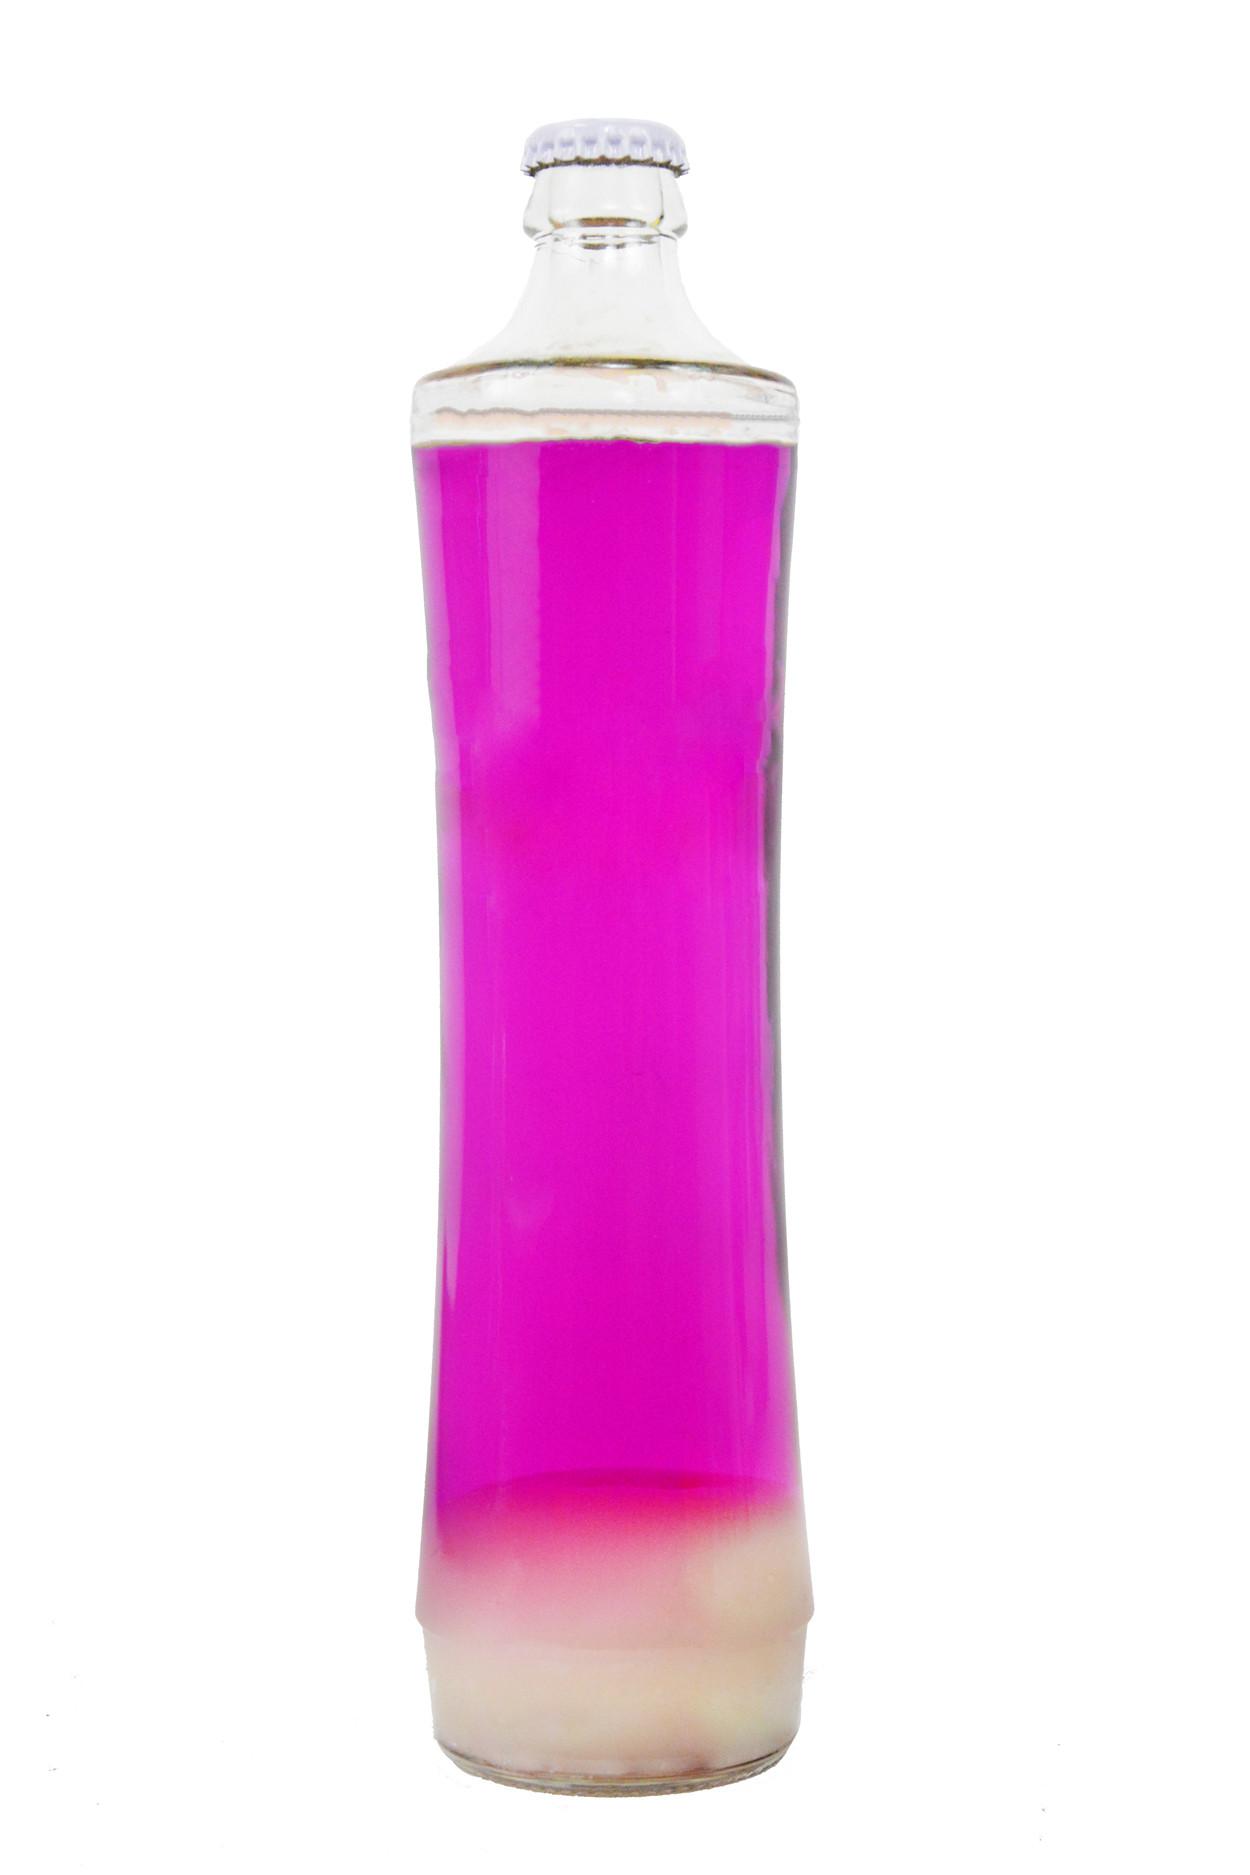 Колба для лава-лампы 39 см Белая/Розовая (21*7 см)